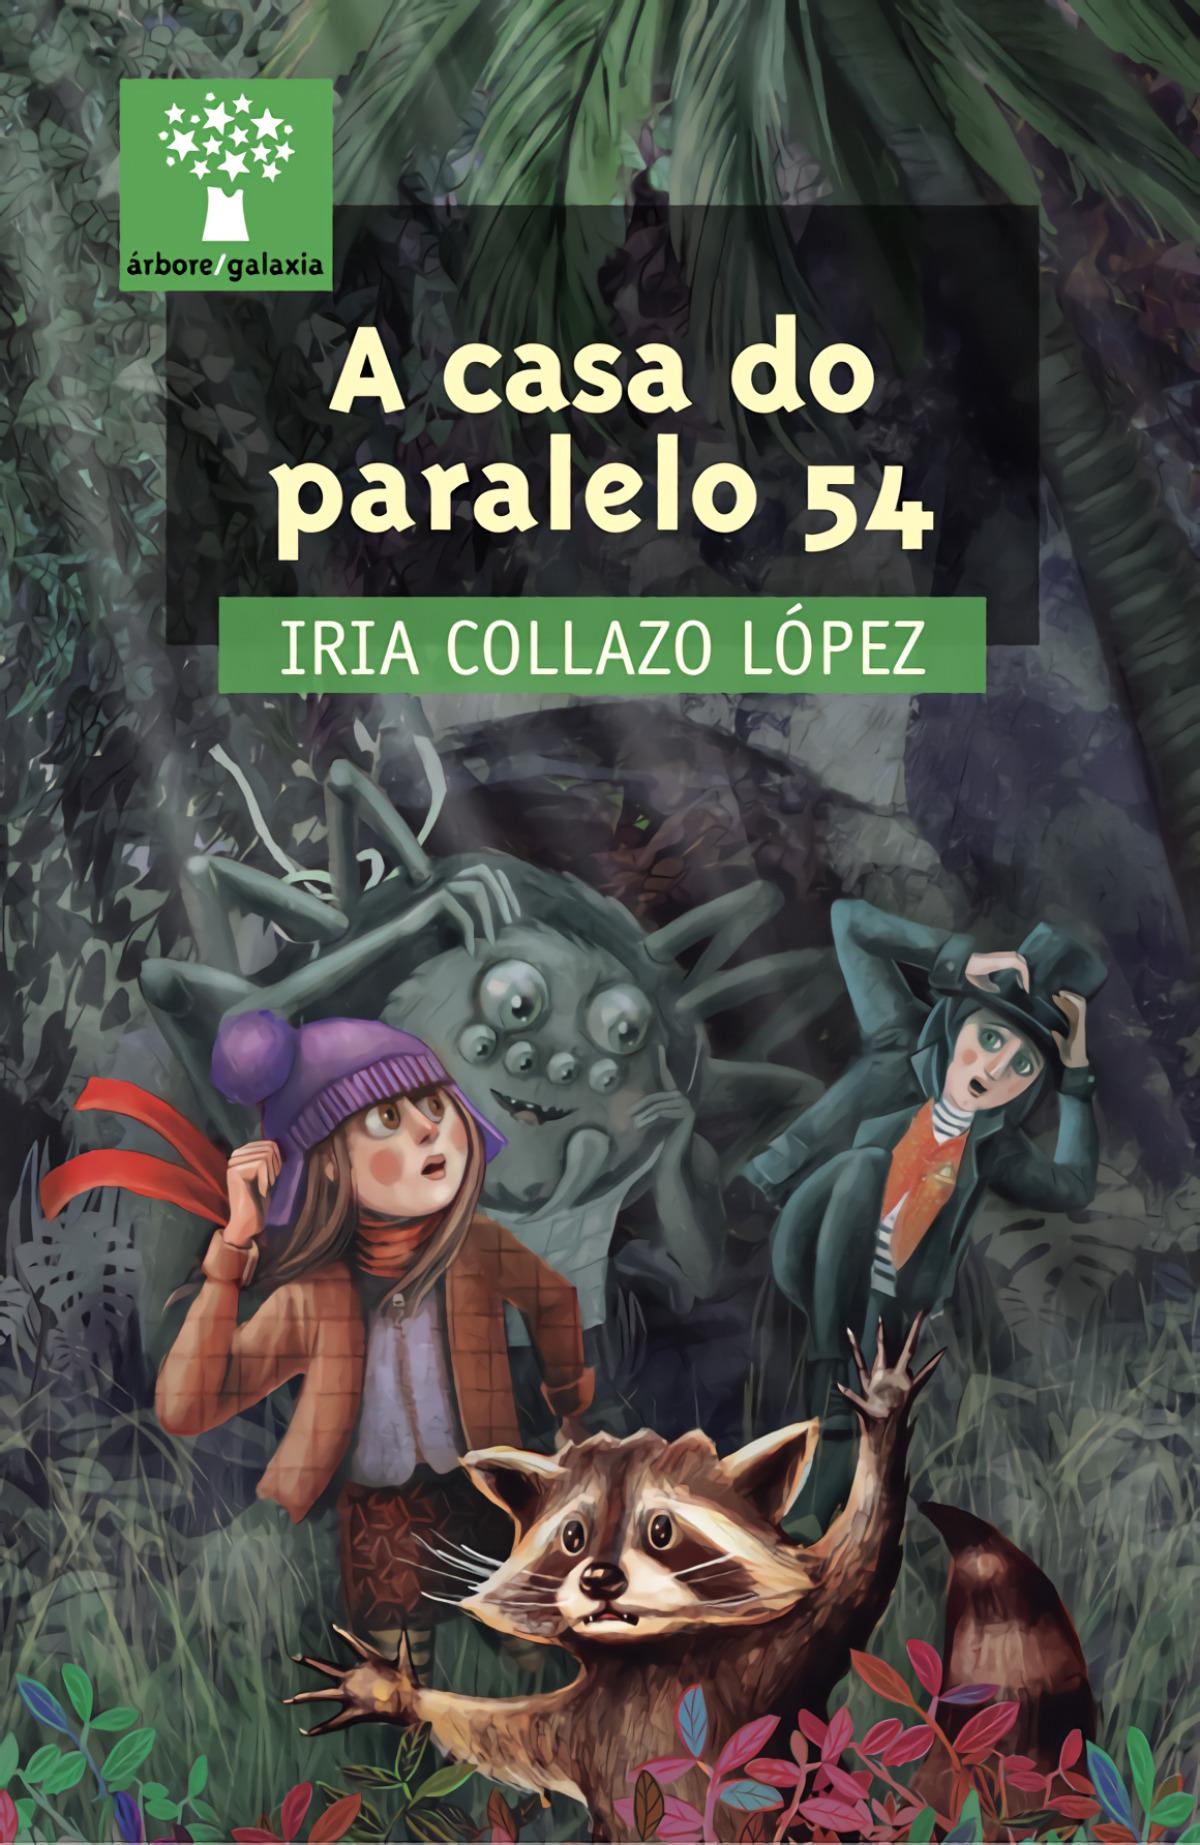 A CASA DO PARALELO 54